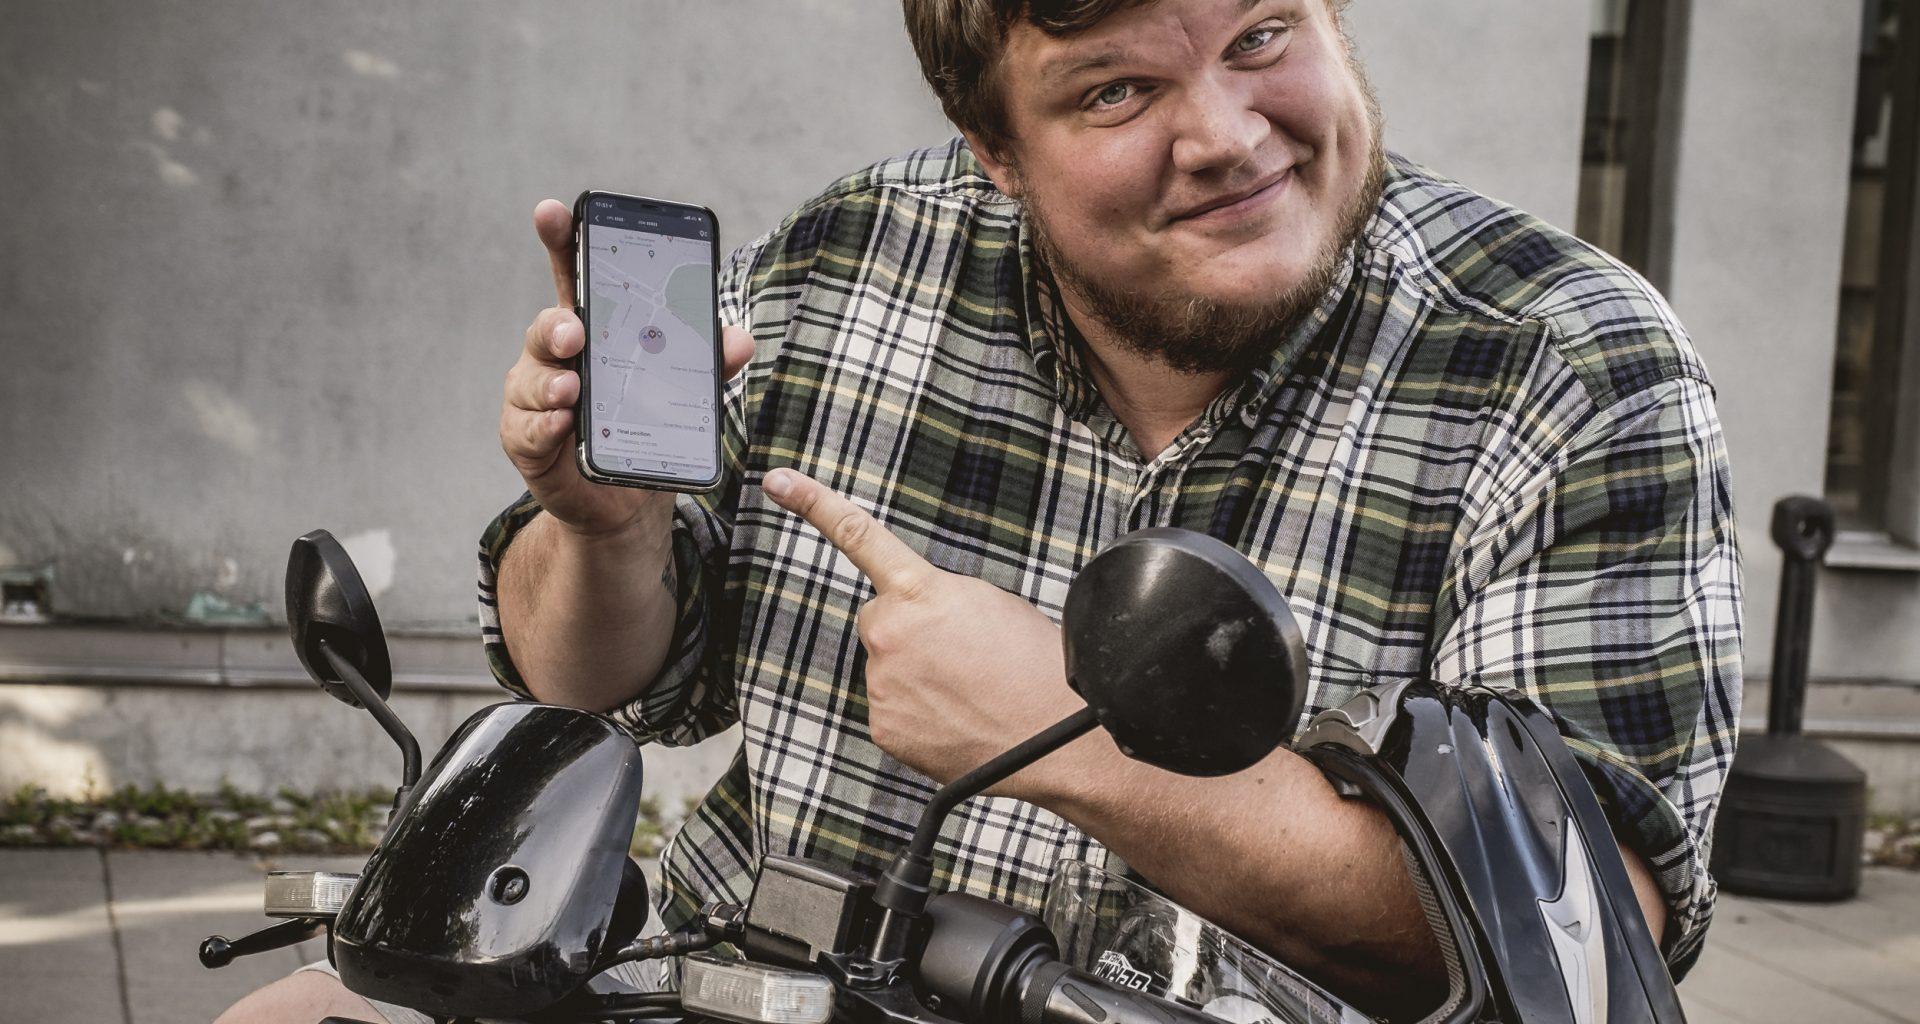 Fredrik muestra la NIU app en su teléfono